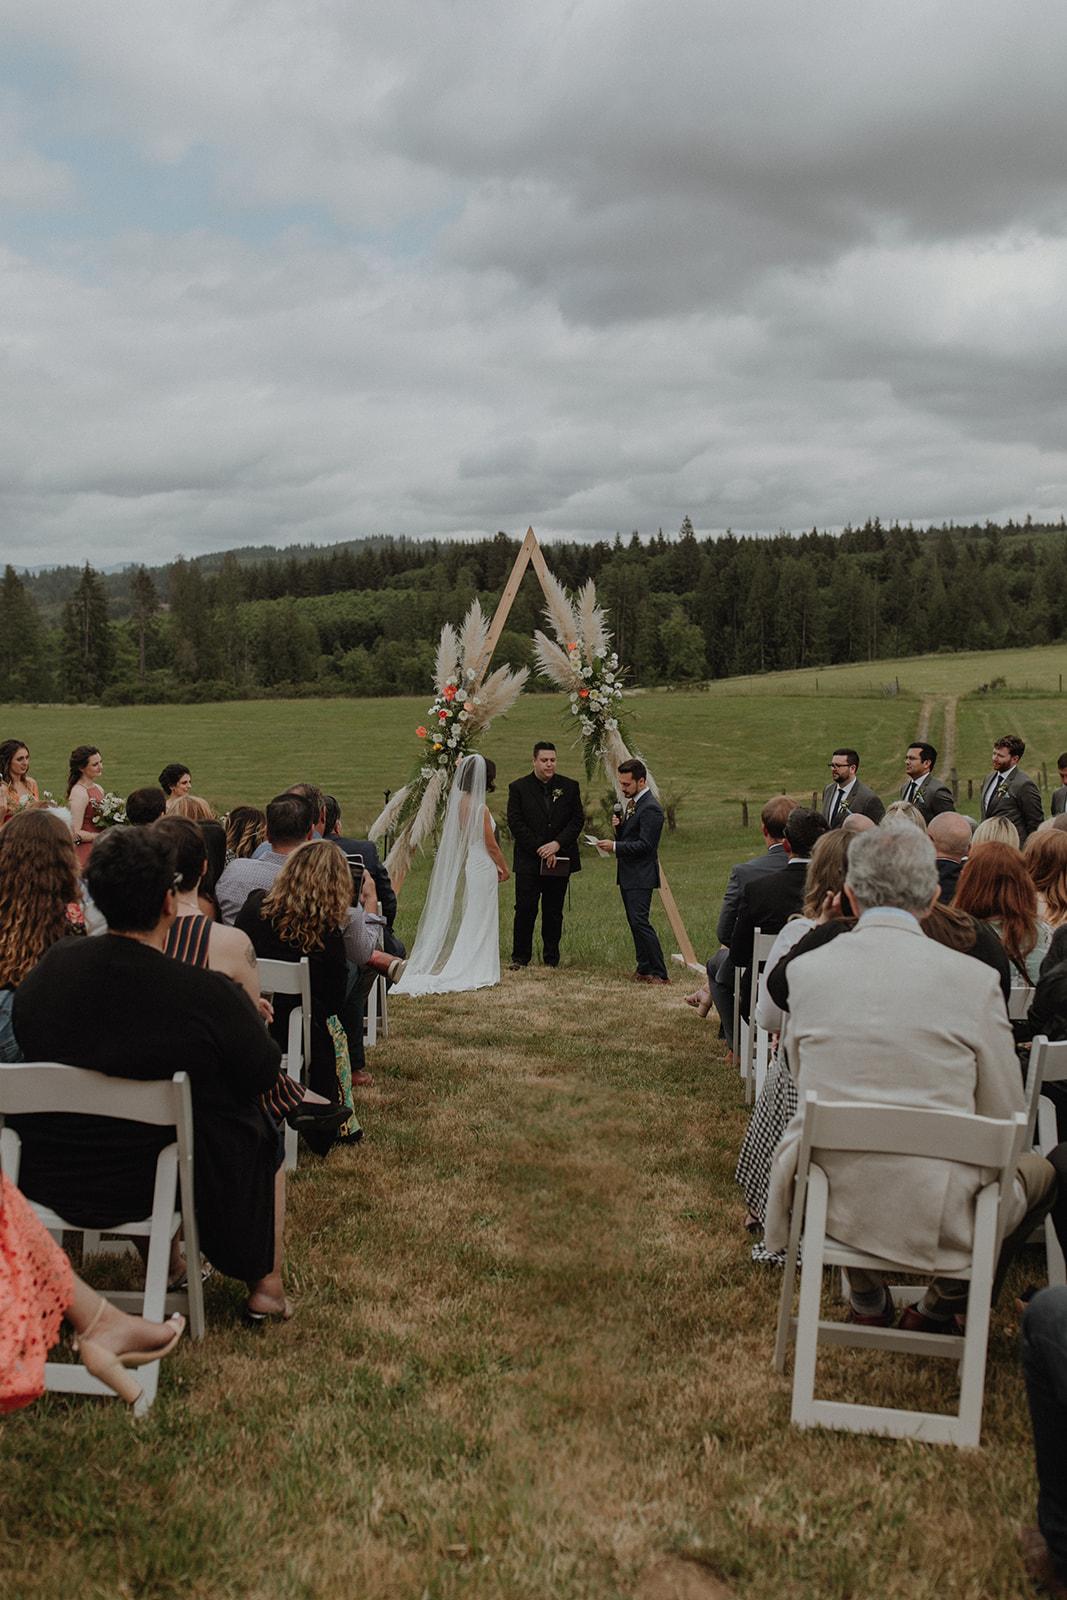 cortney_skye_wedding_june2019-409.jpg